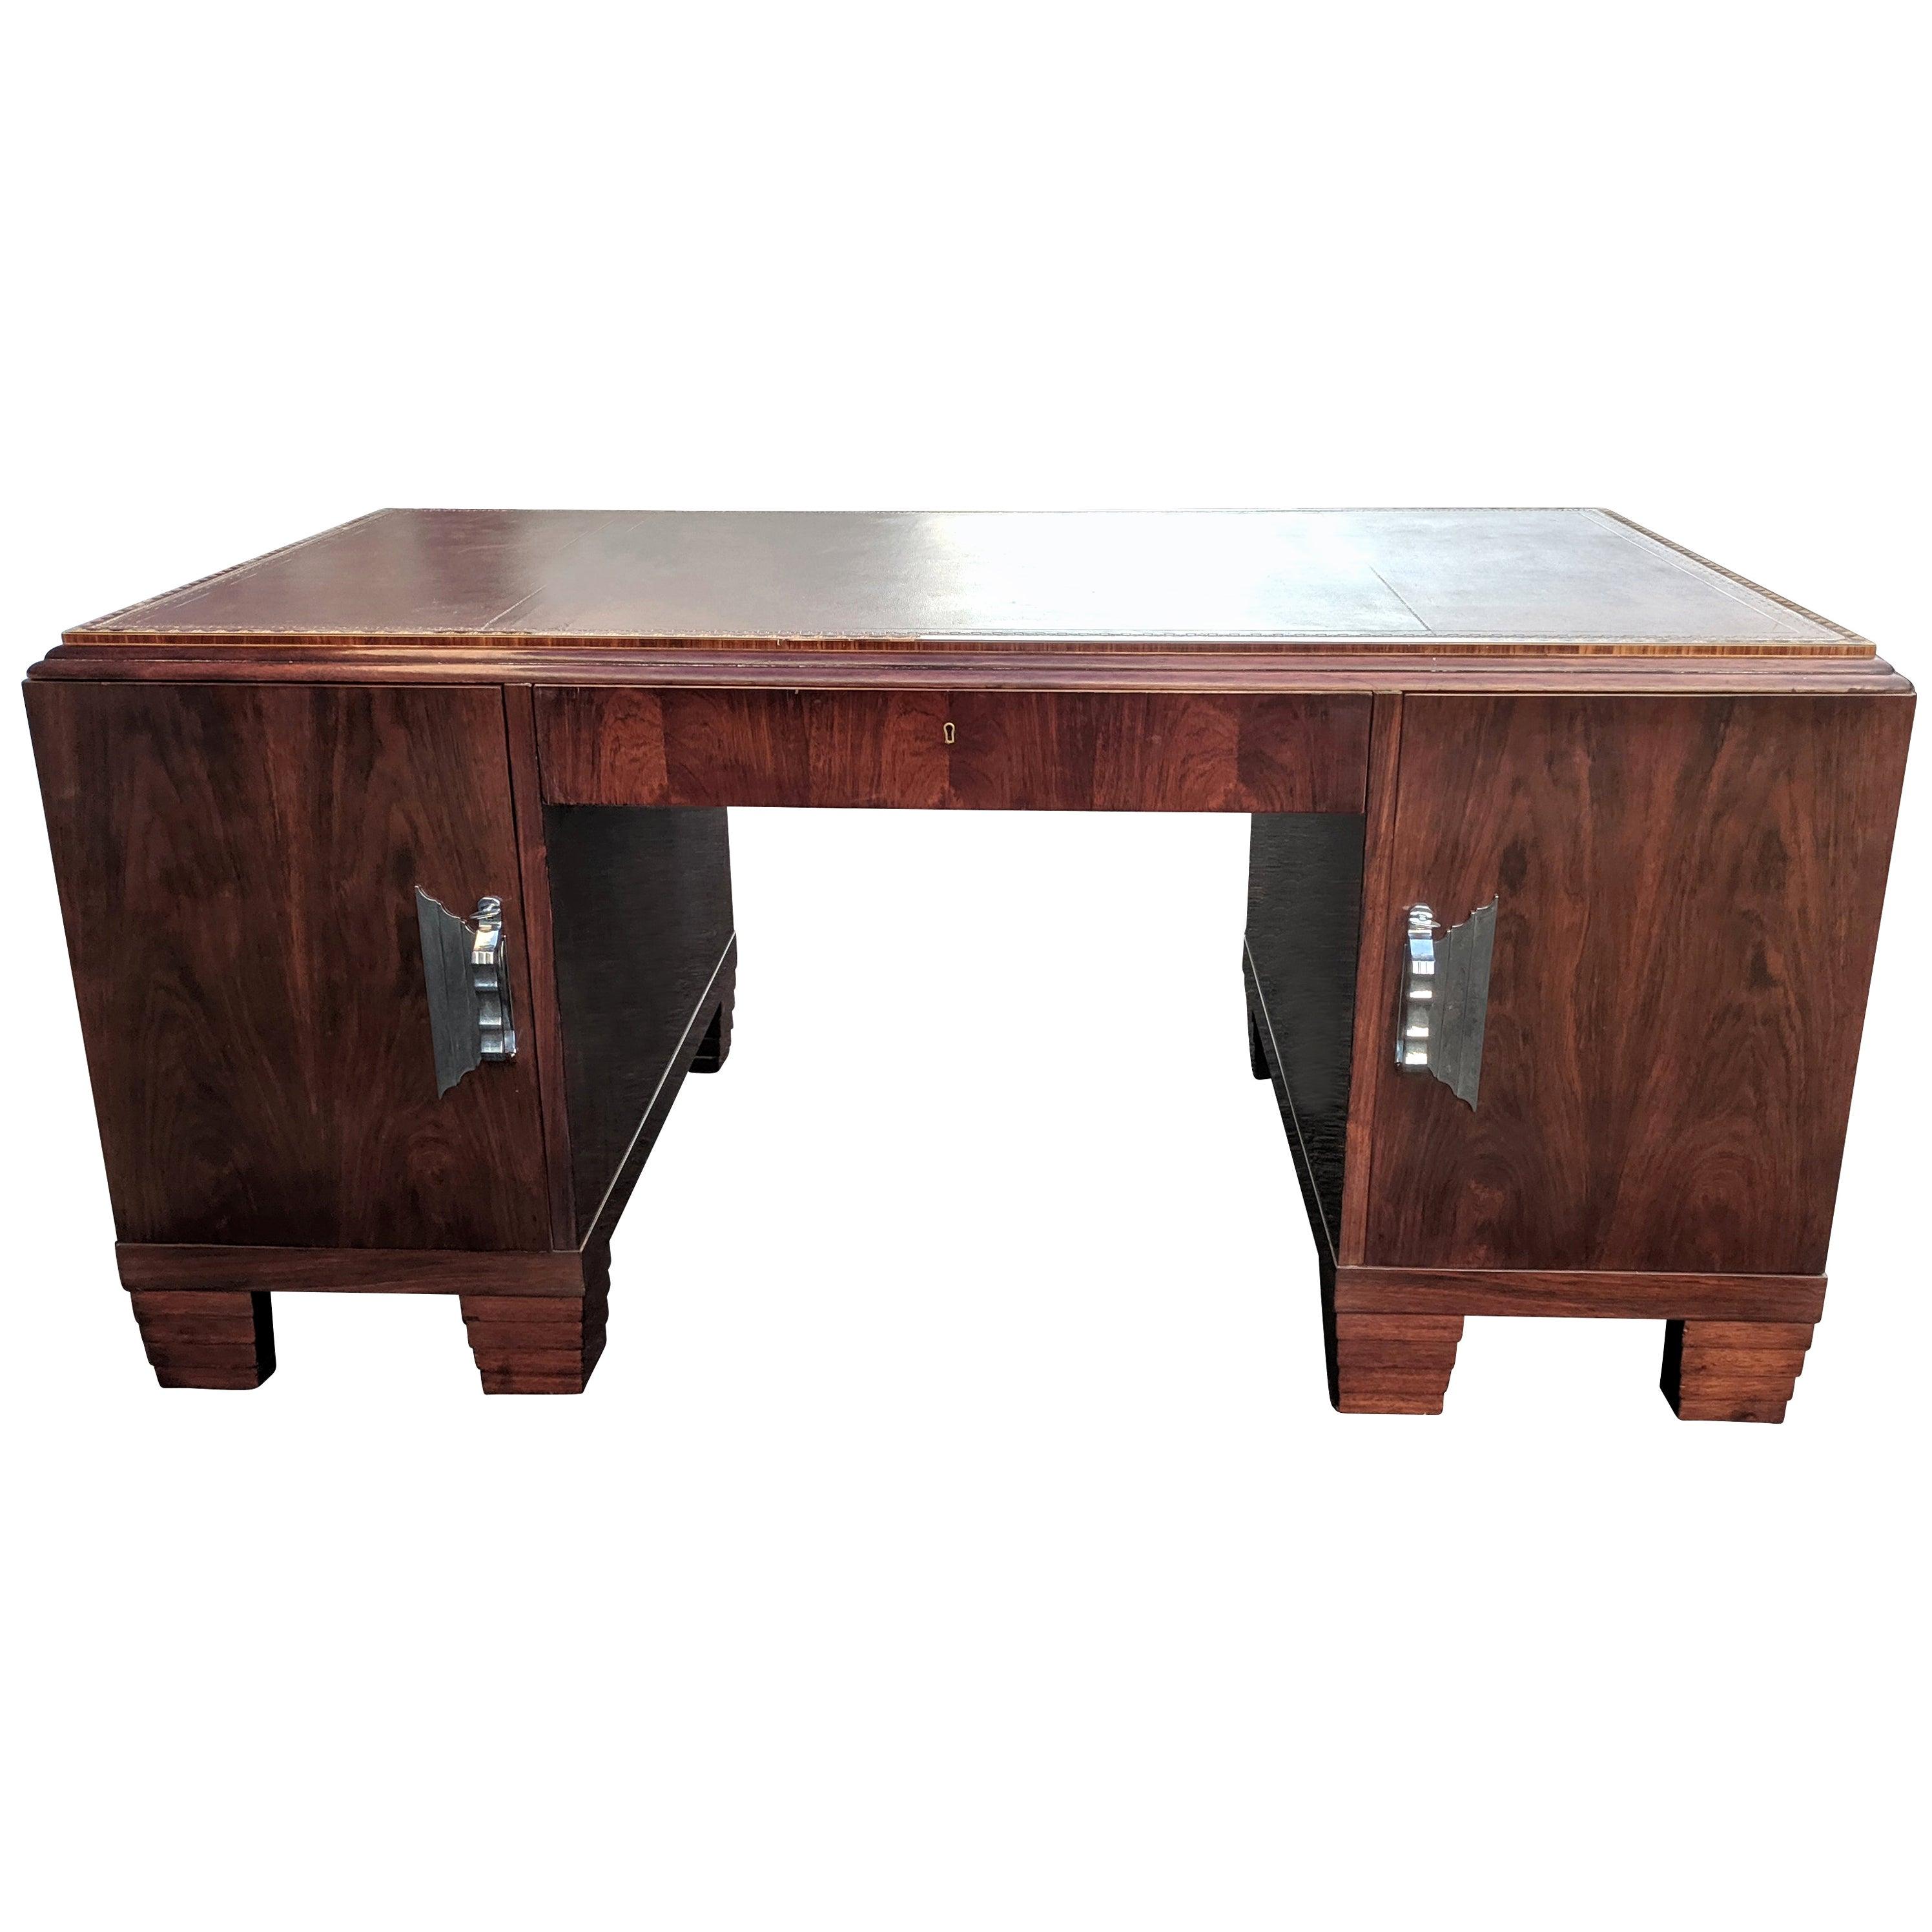 Art Deco Modernist Partners Desk, circa 1930